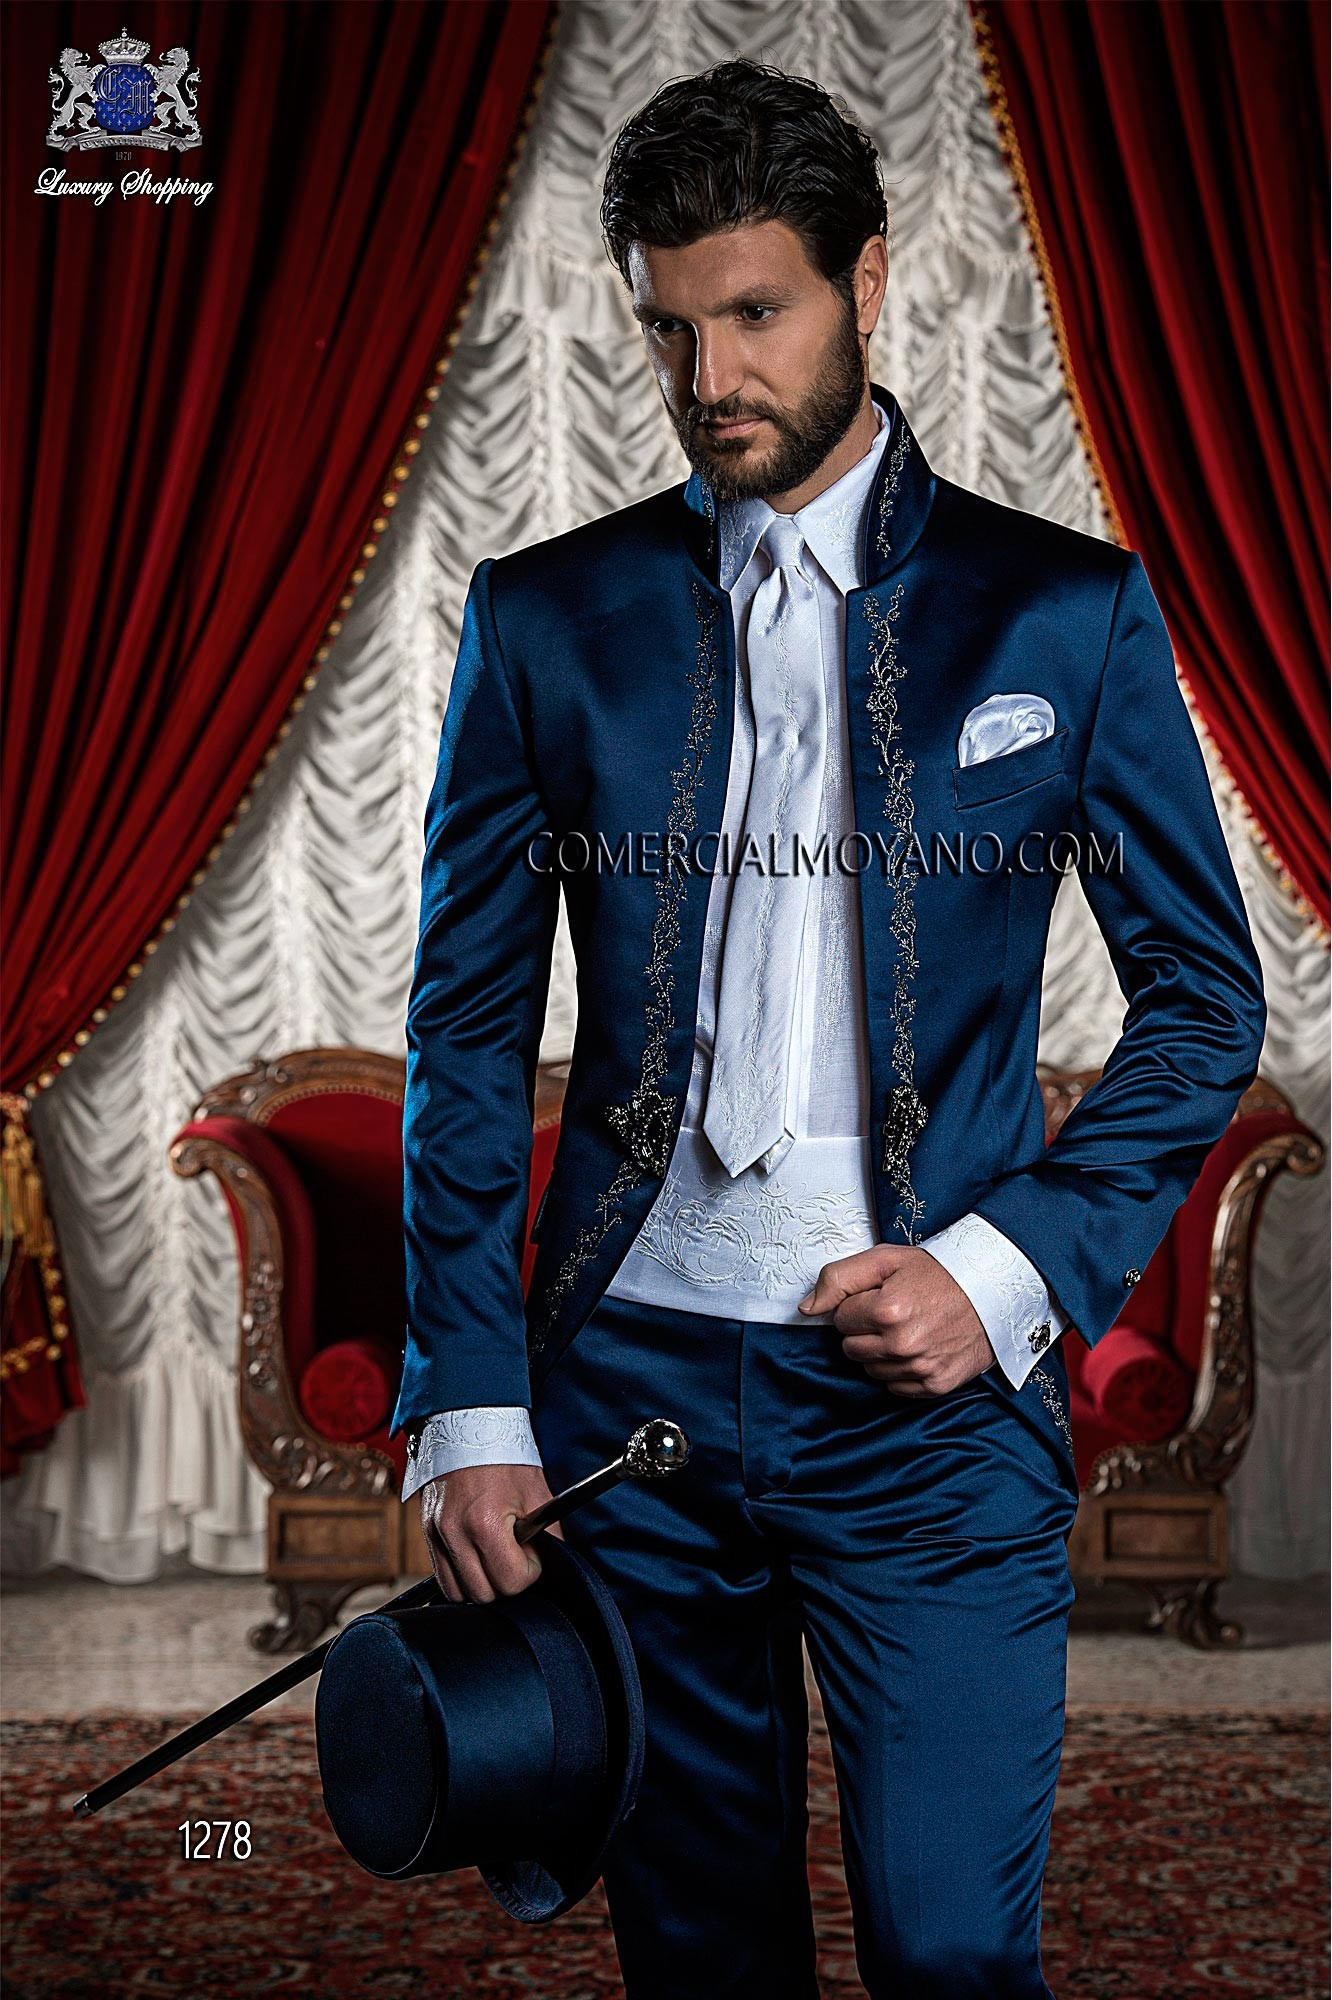 Traje de novio Levita Redingote Coreana de raso azul con bordado flores en plata, modelo 1278 Ottavio Nuccio Gala colección Barroco 2015.